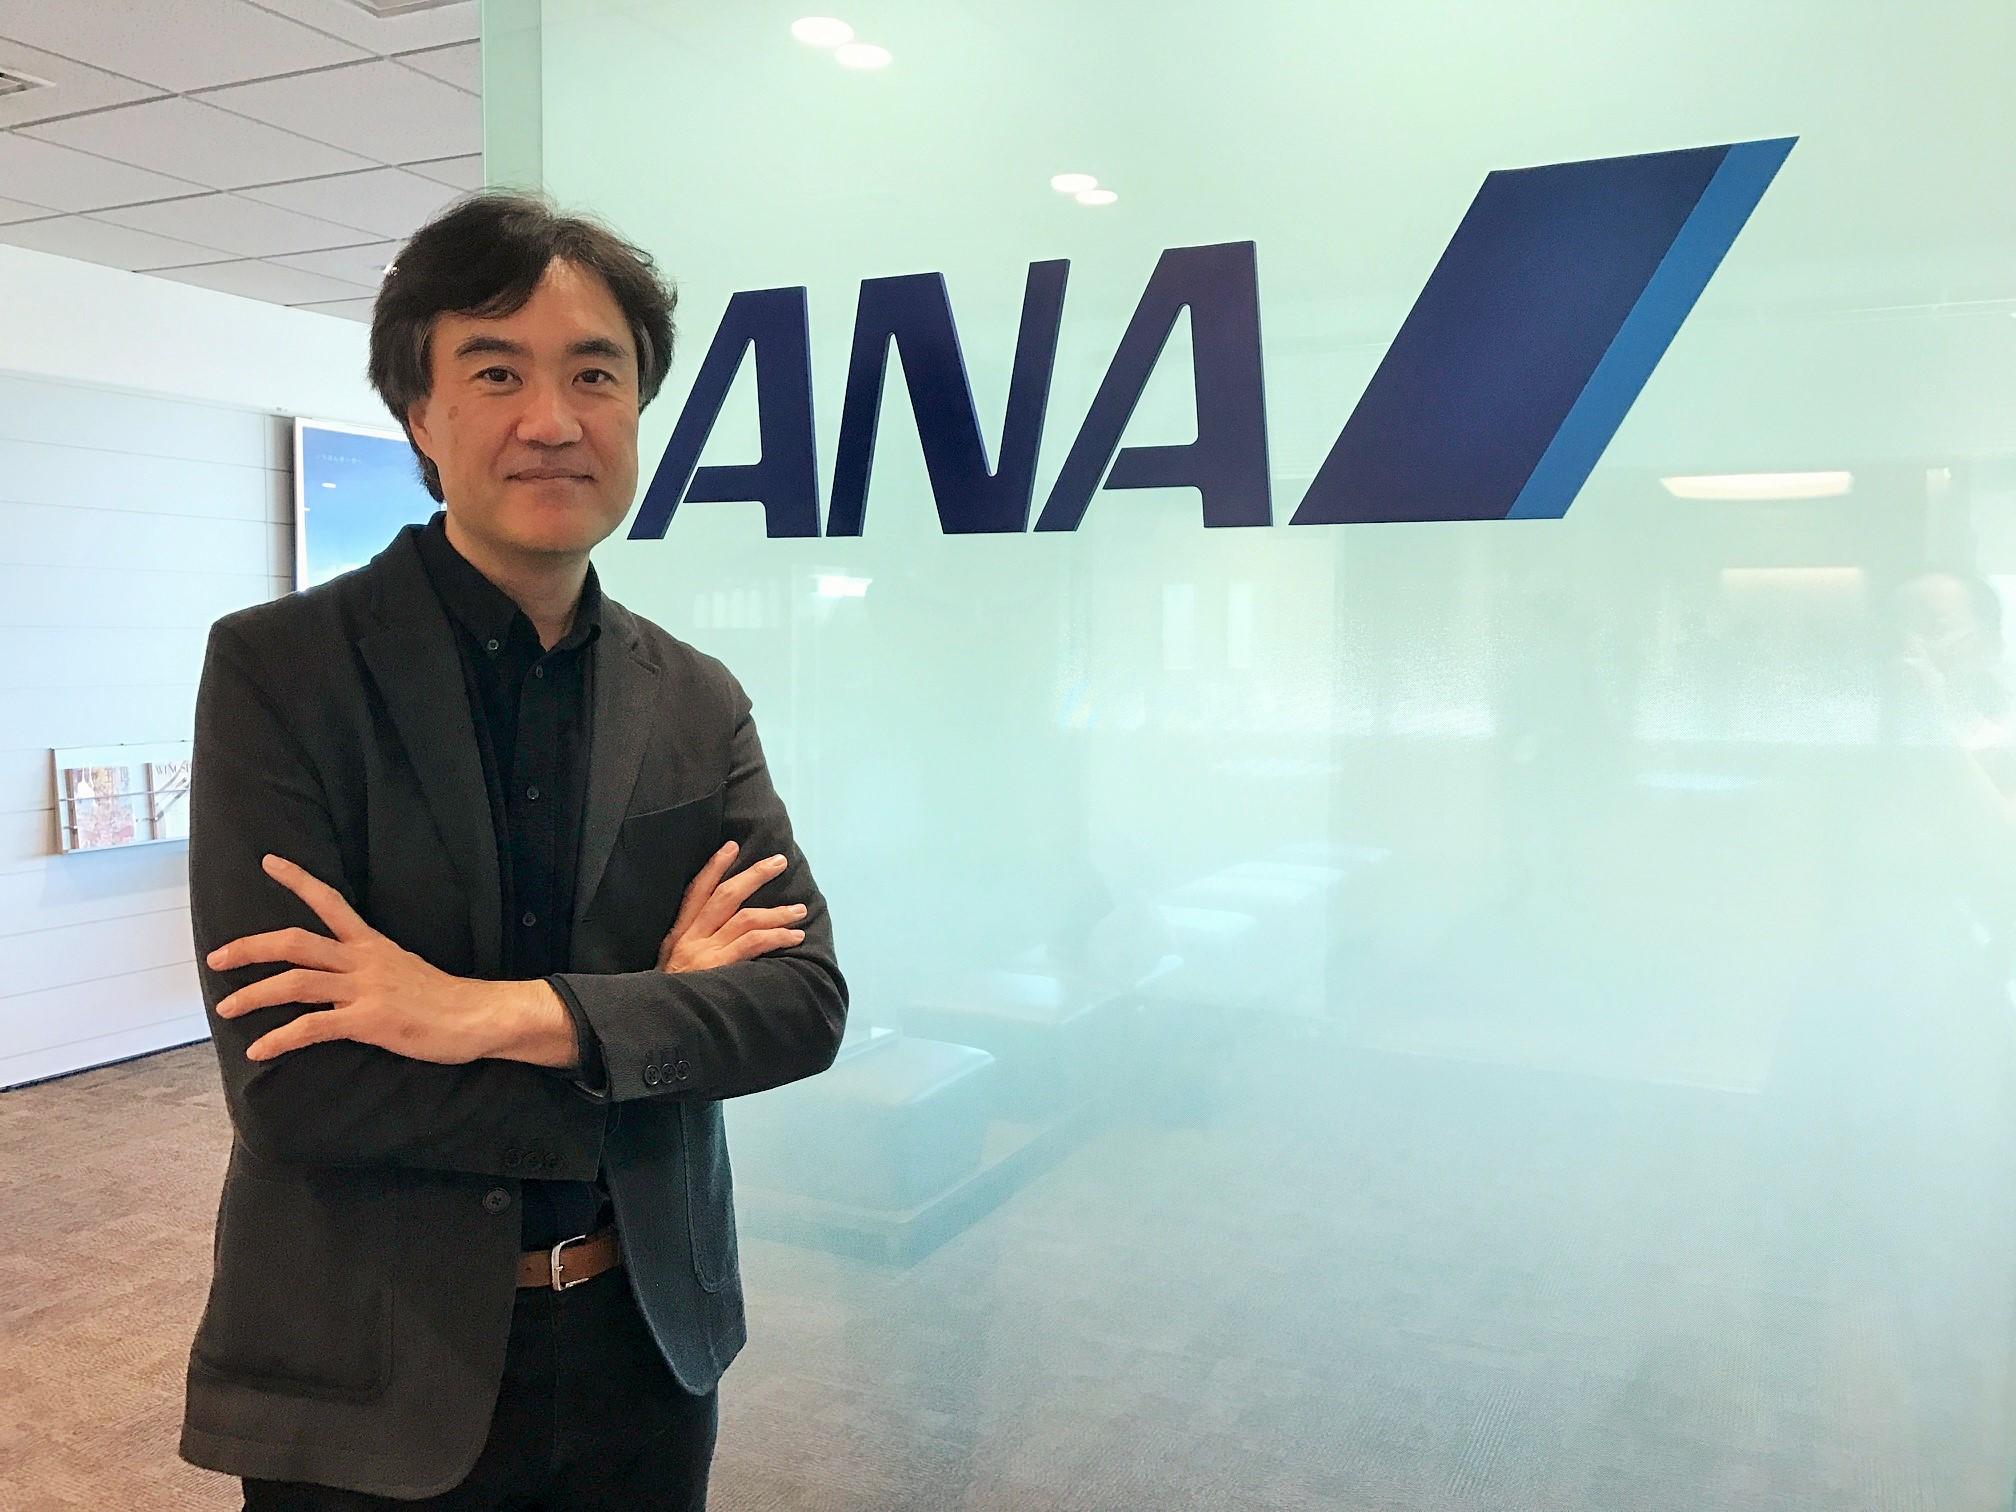 ANAがシェアリングエコノミーに注力する理由とは? 遊び心から生まれる近未来への取り組みを聞いてきた